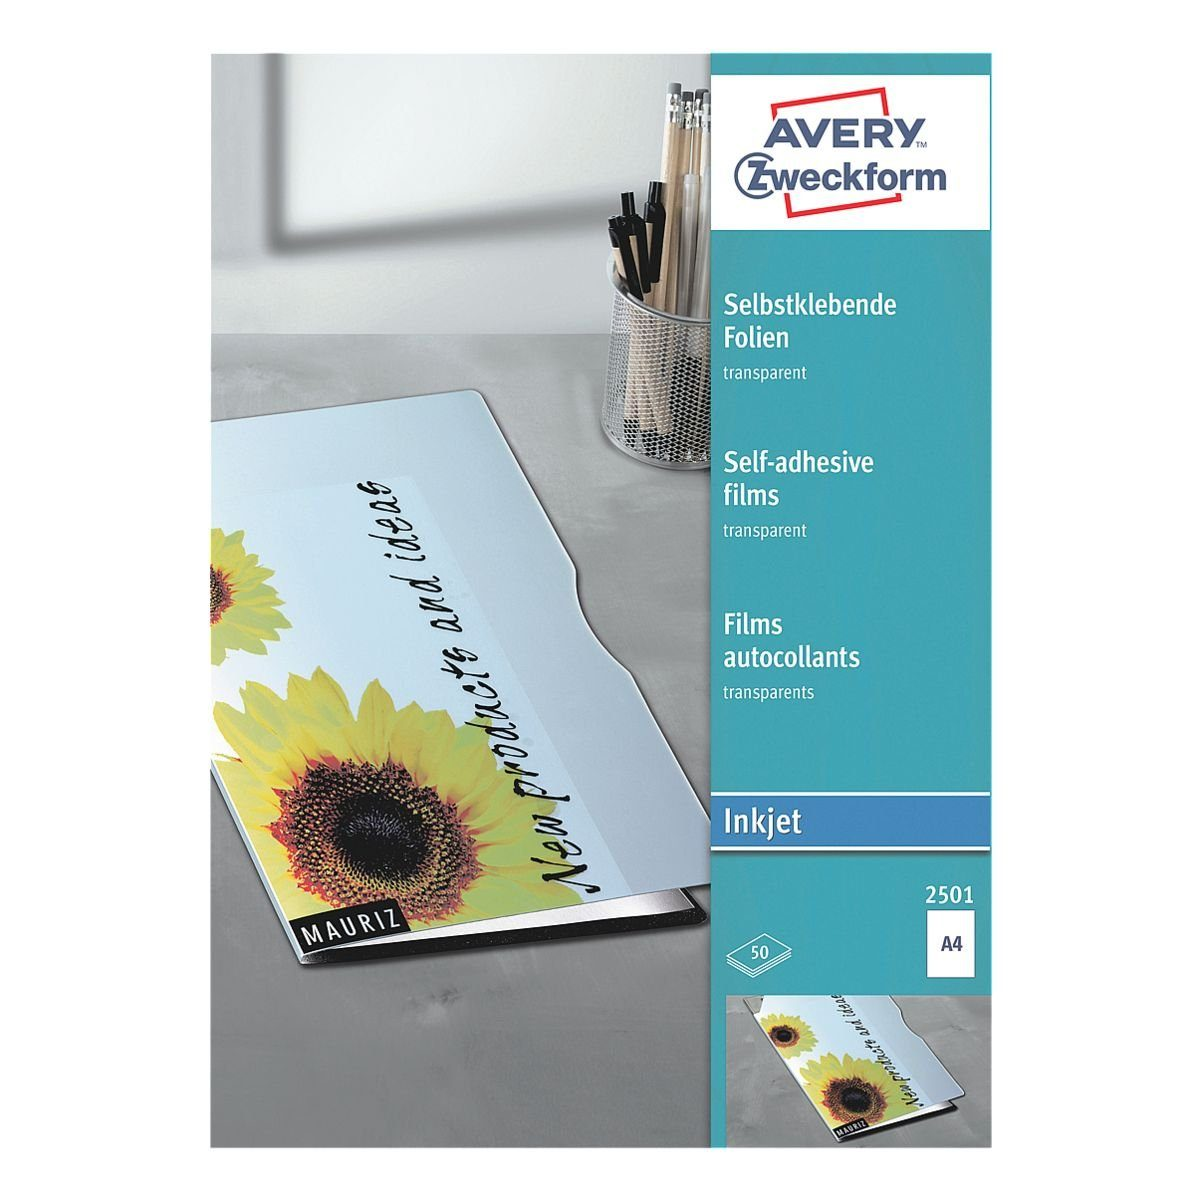 Avery Zweckform Selbstklebende Folien